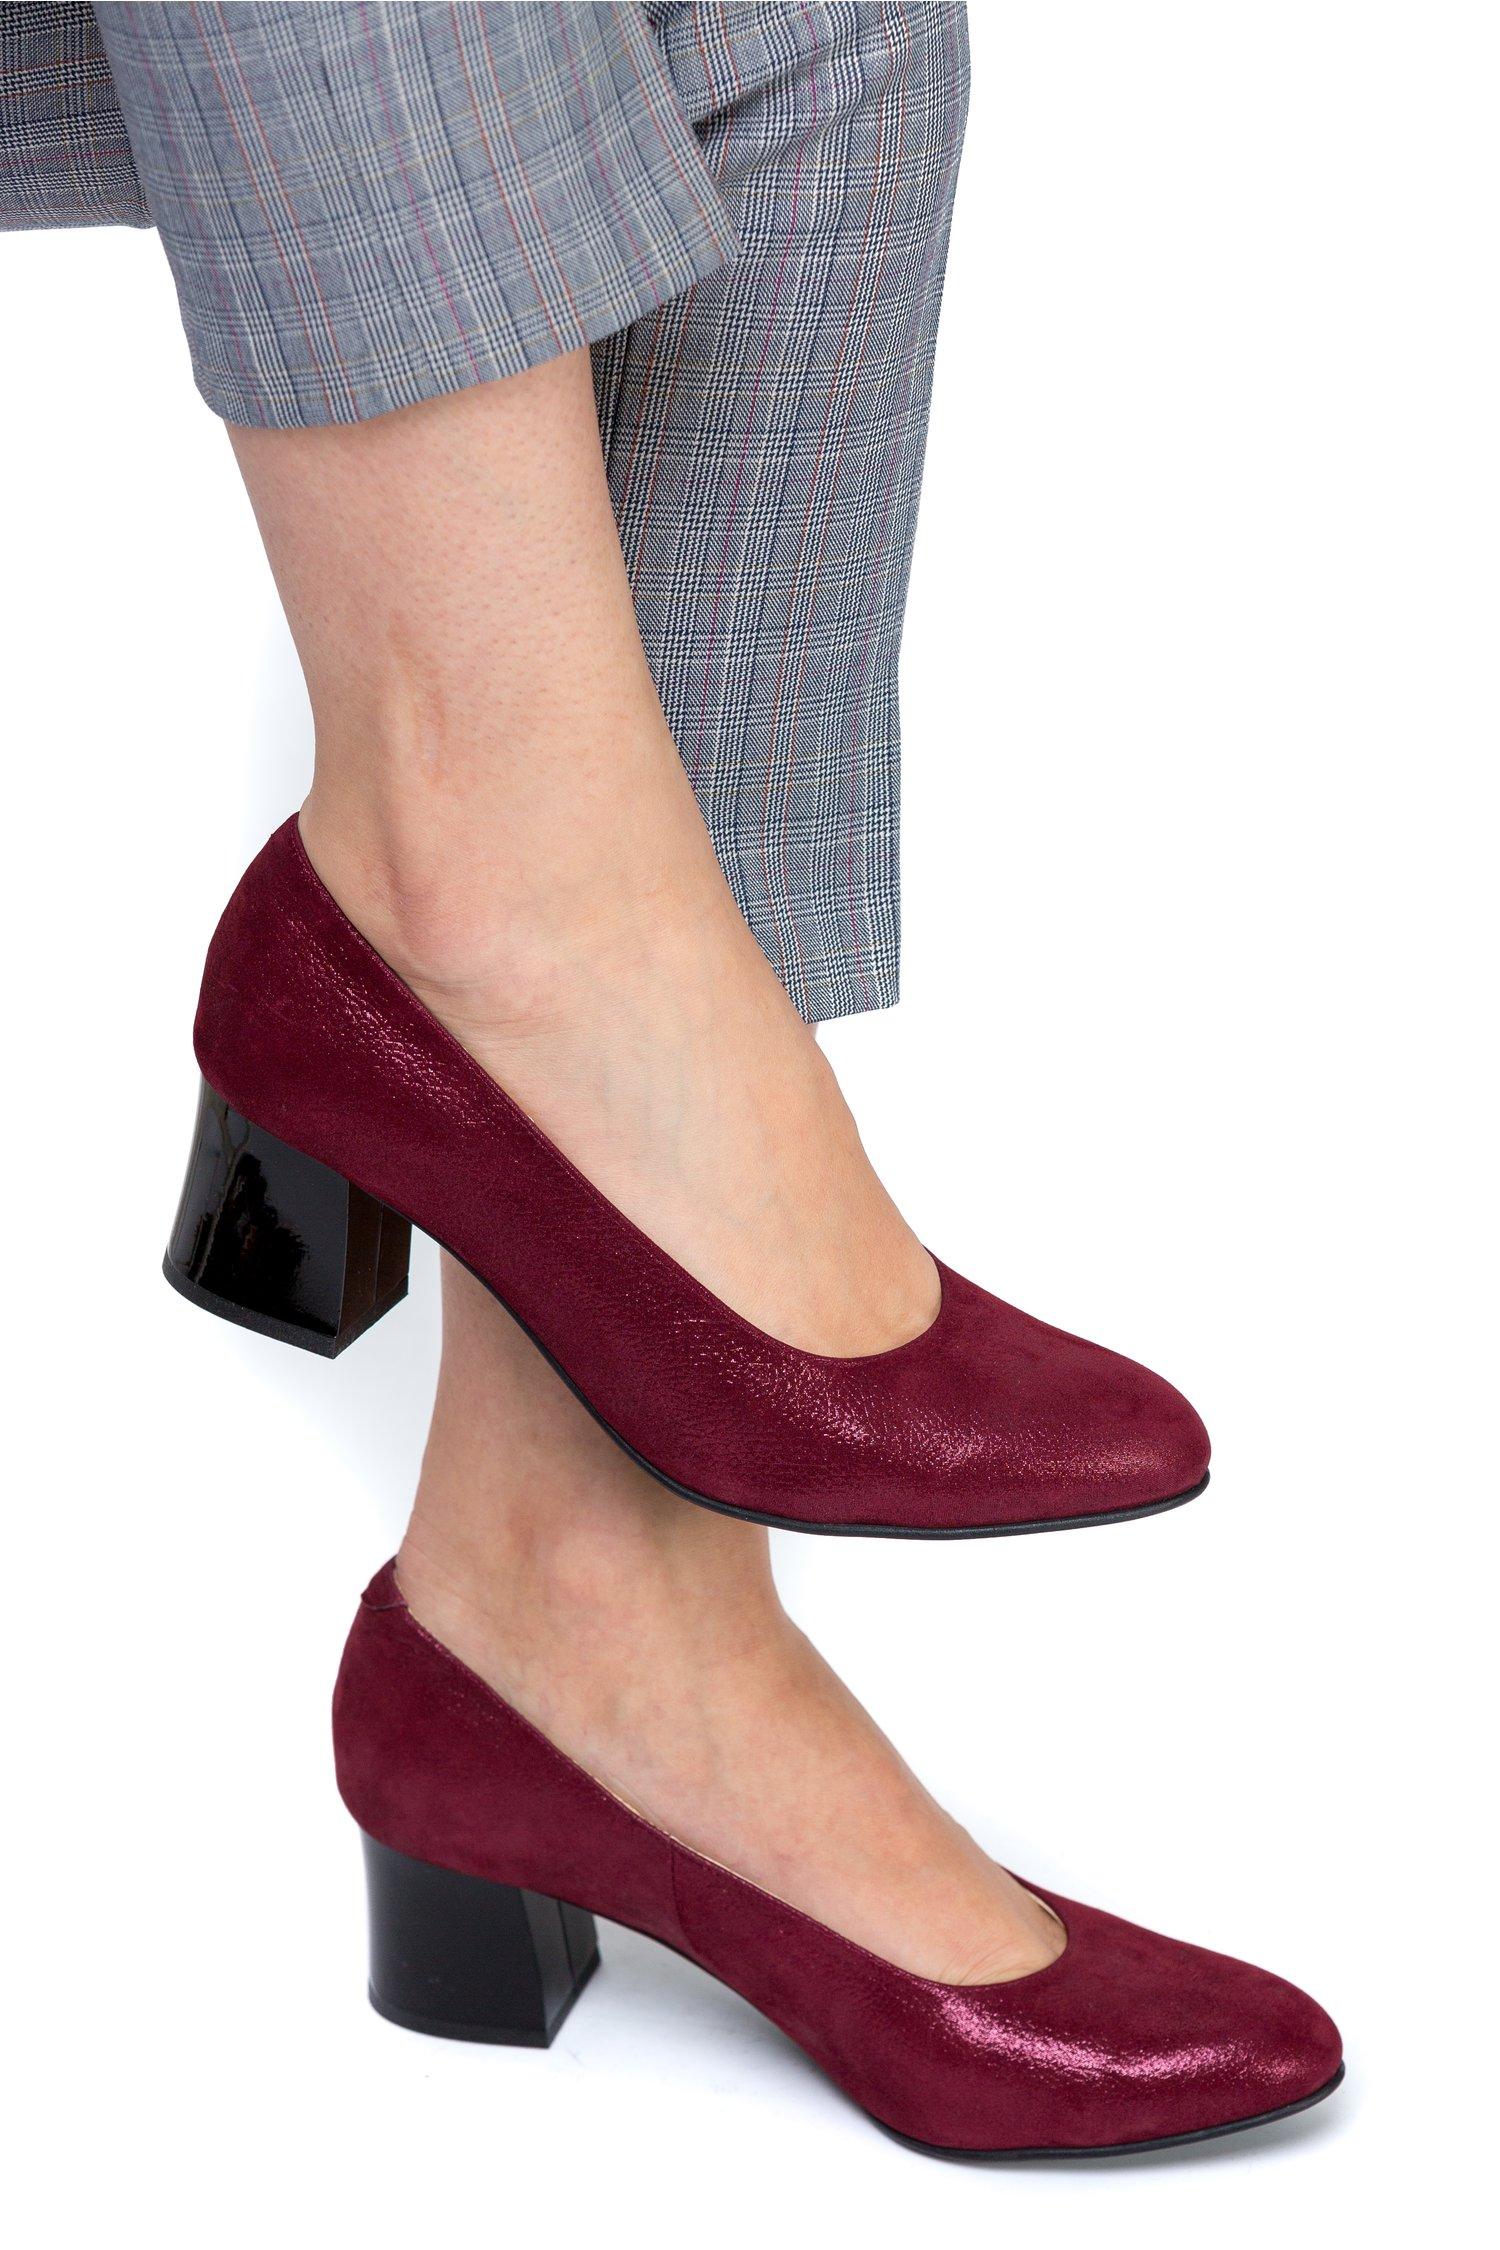 Pantofi Aidin bordo sidef cu toc negru